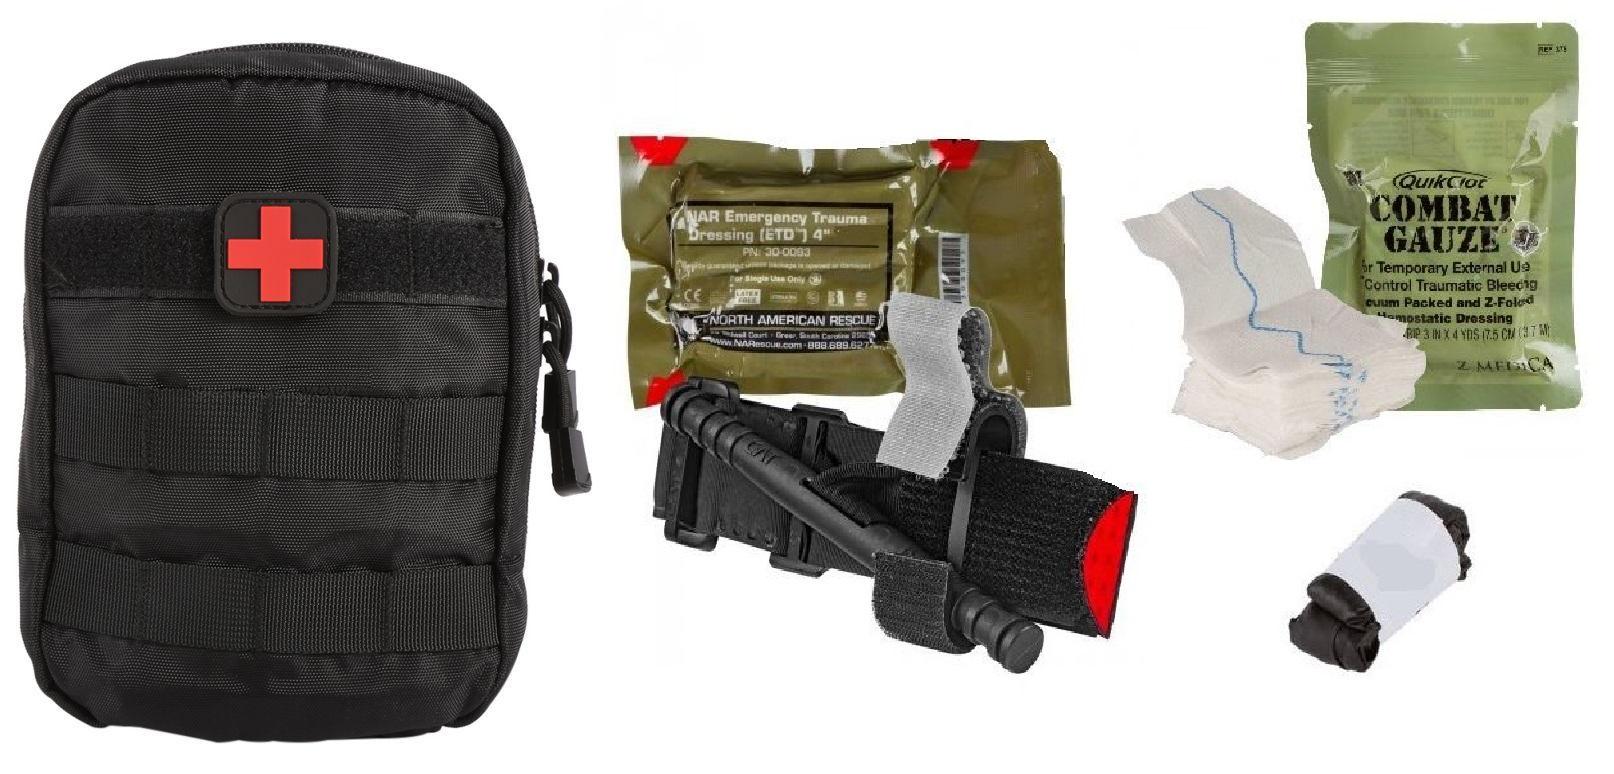 Individual Patrol Officer Kit IPOK with Molle Bag & Combat Gauze